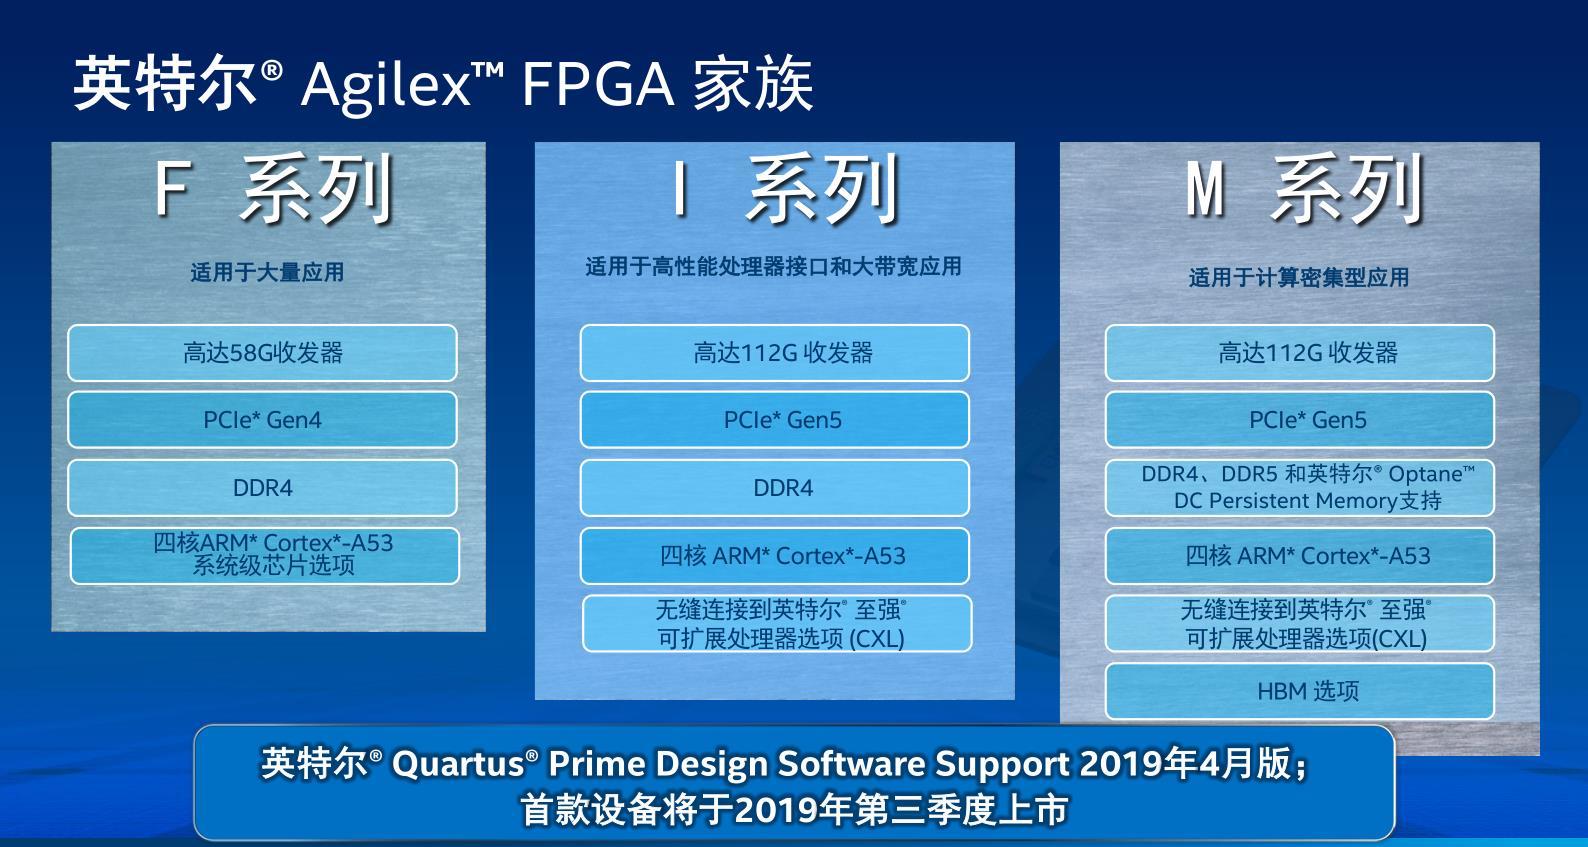 Agilex分成三個型號,通用型的F系列,強調高連接性能的I系列和高存儲、計算性能的M系列。